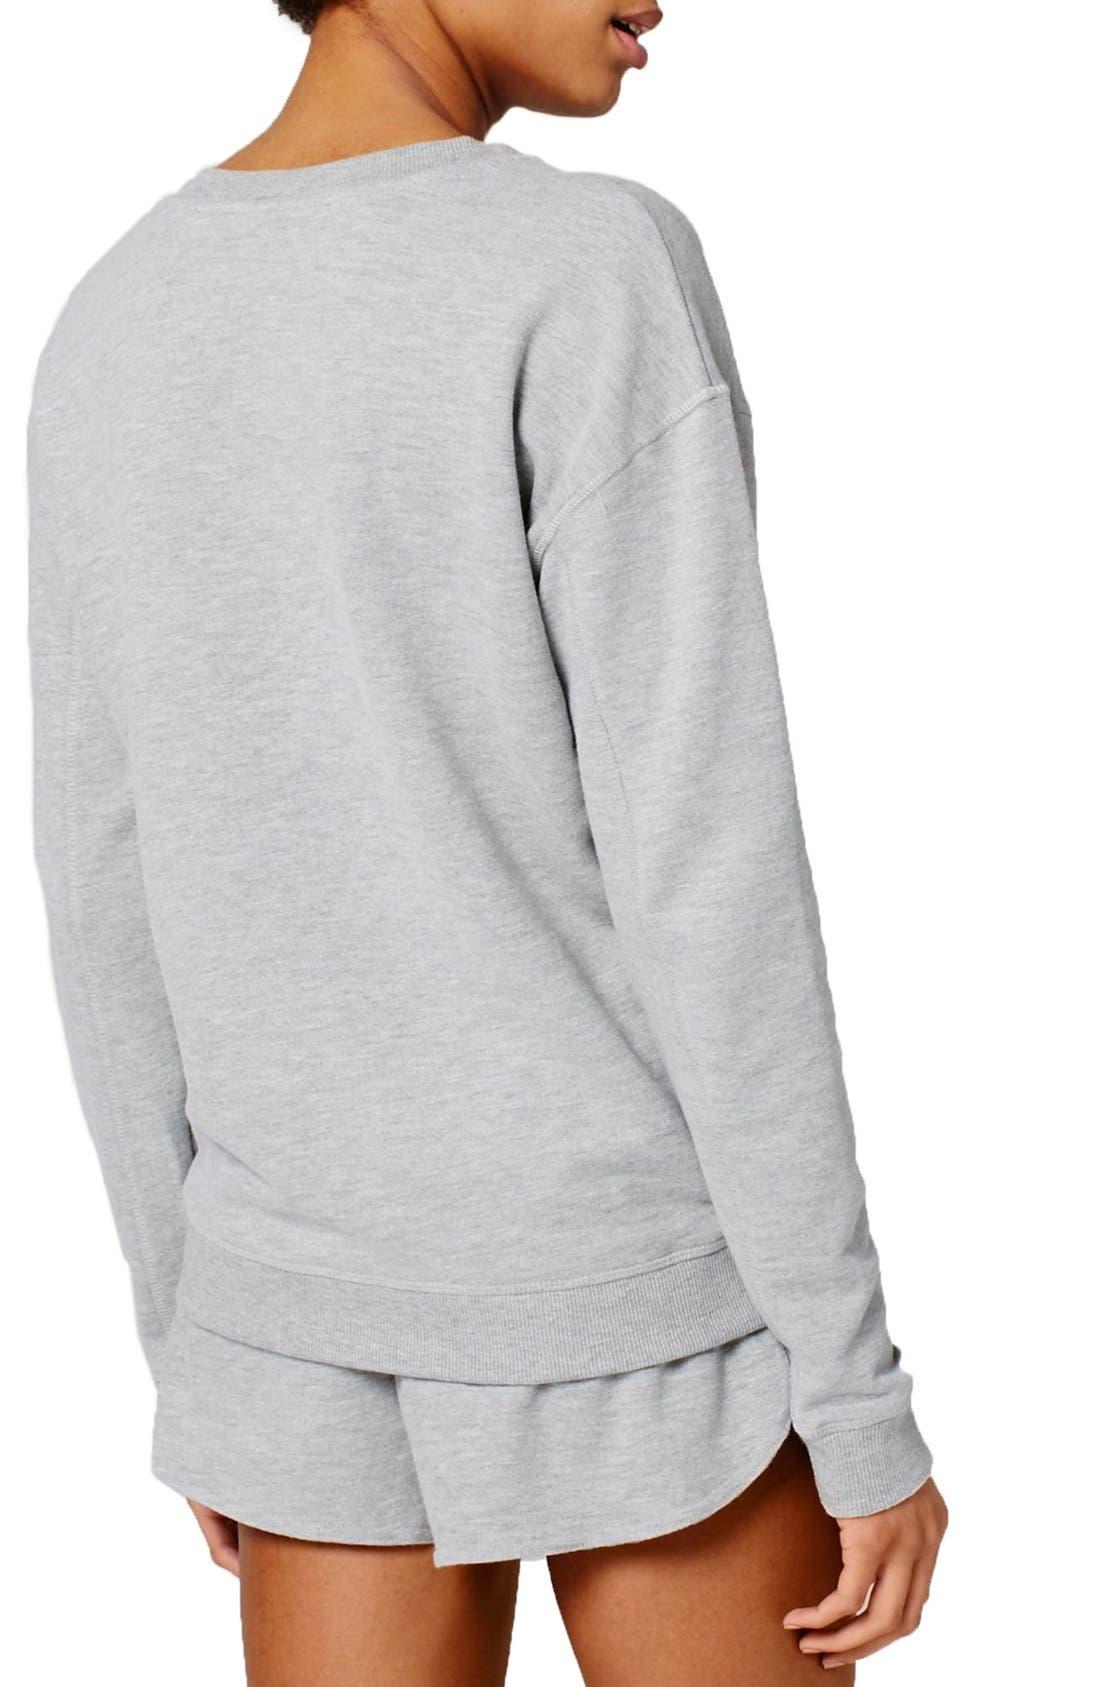 Alternate Image 3  - IVY PARK® Logo Crewneck Sweatshirt